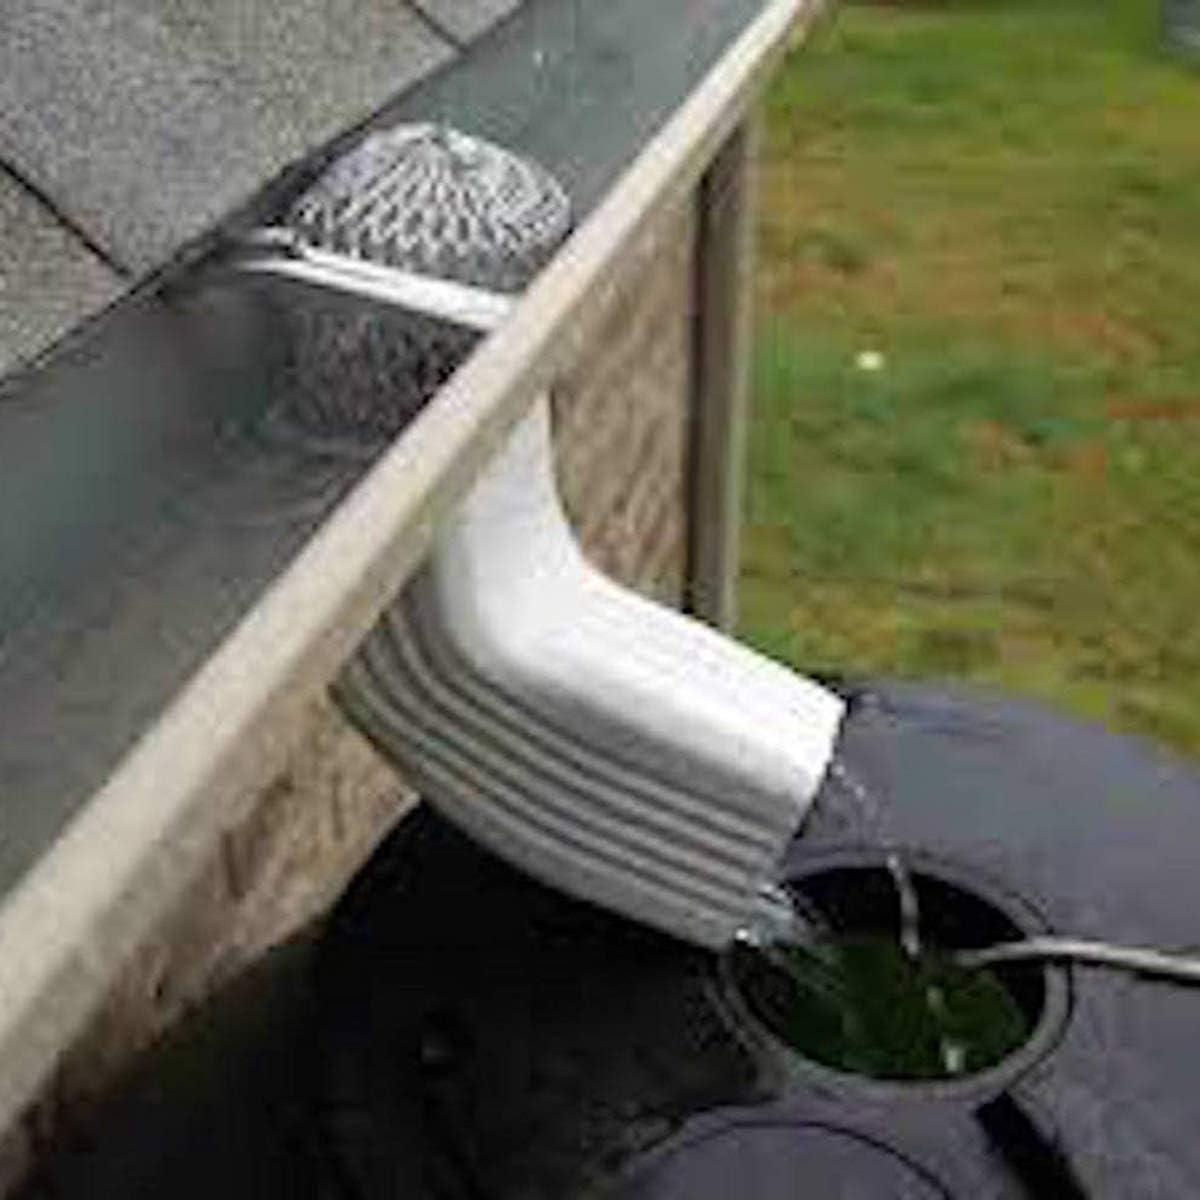 iFCOW 4pcs Gutter Guard 3Inch Filtro de Hoja de colador de canal/ón expandible